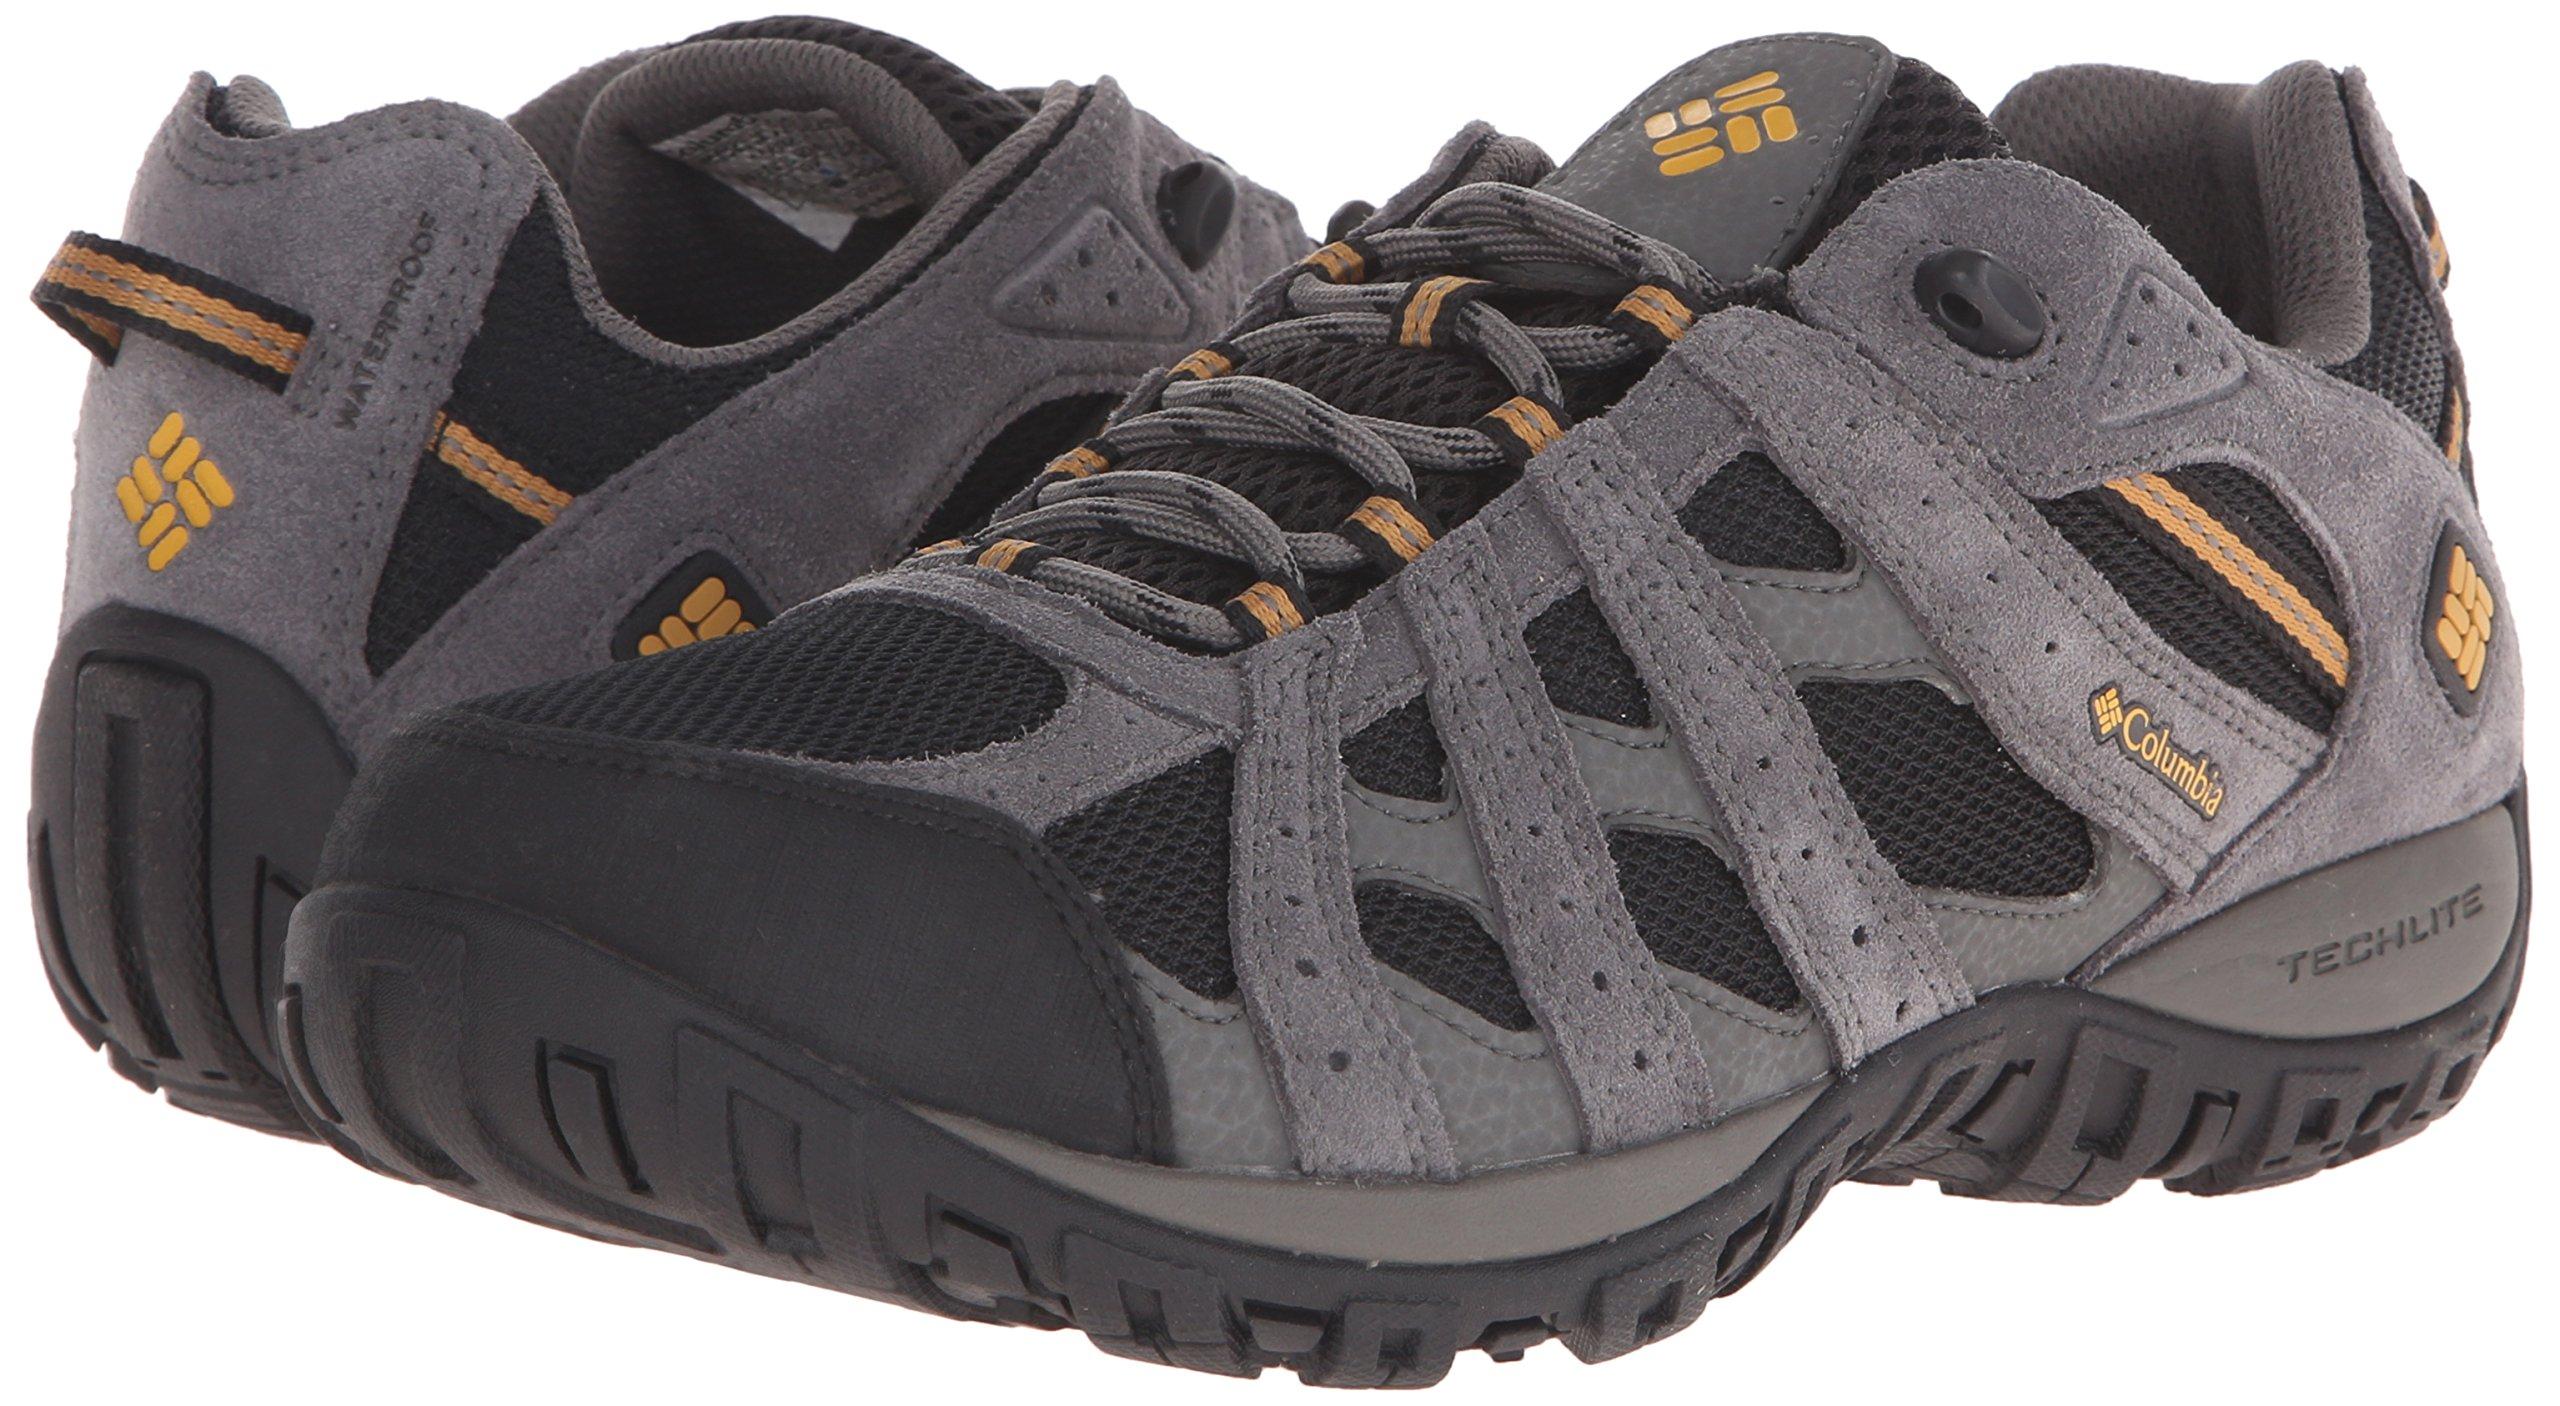 Columbia Men's Redmond Waterproof Hiking Shoe Black, Squash 7.5 D US by Columbia (Image #6)